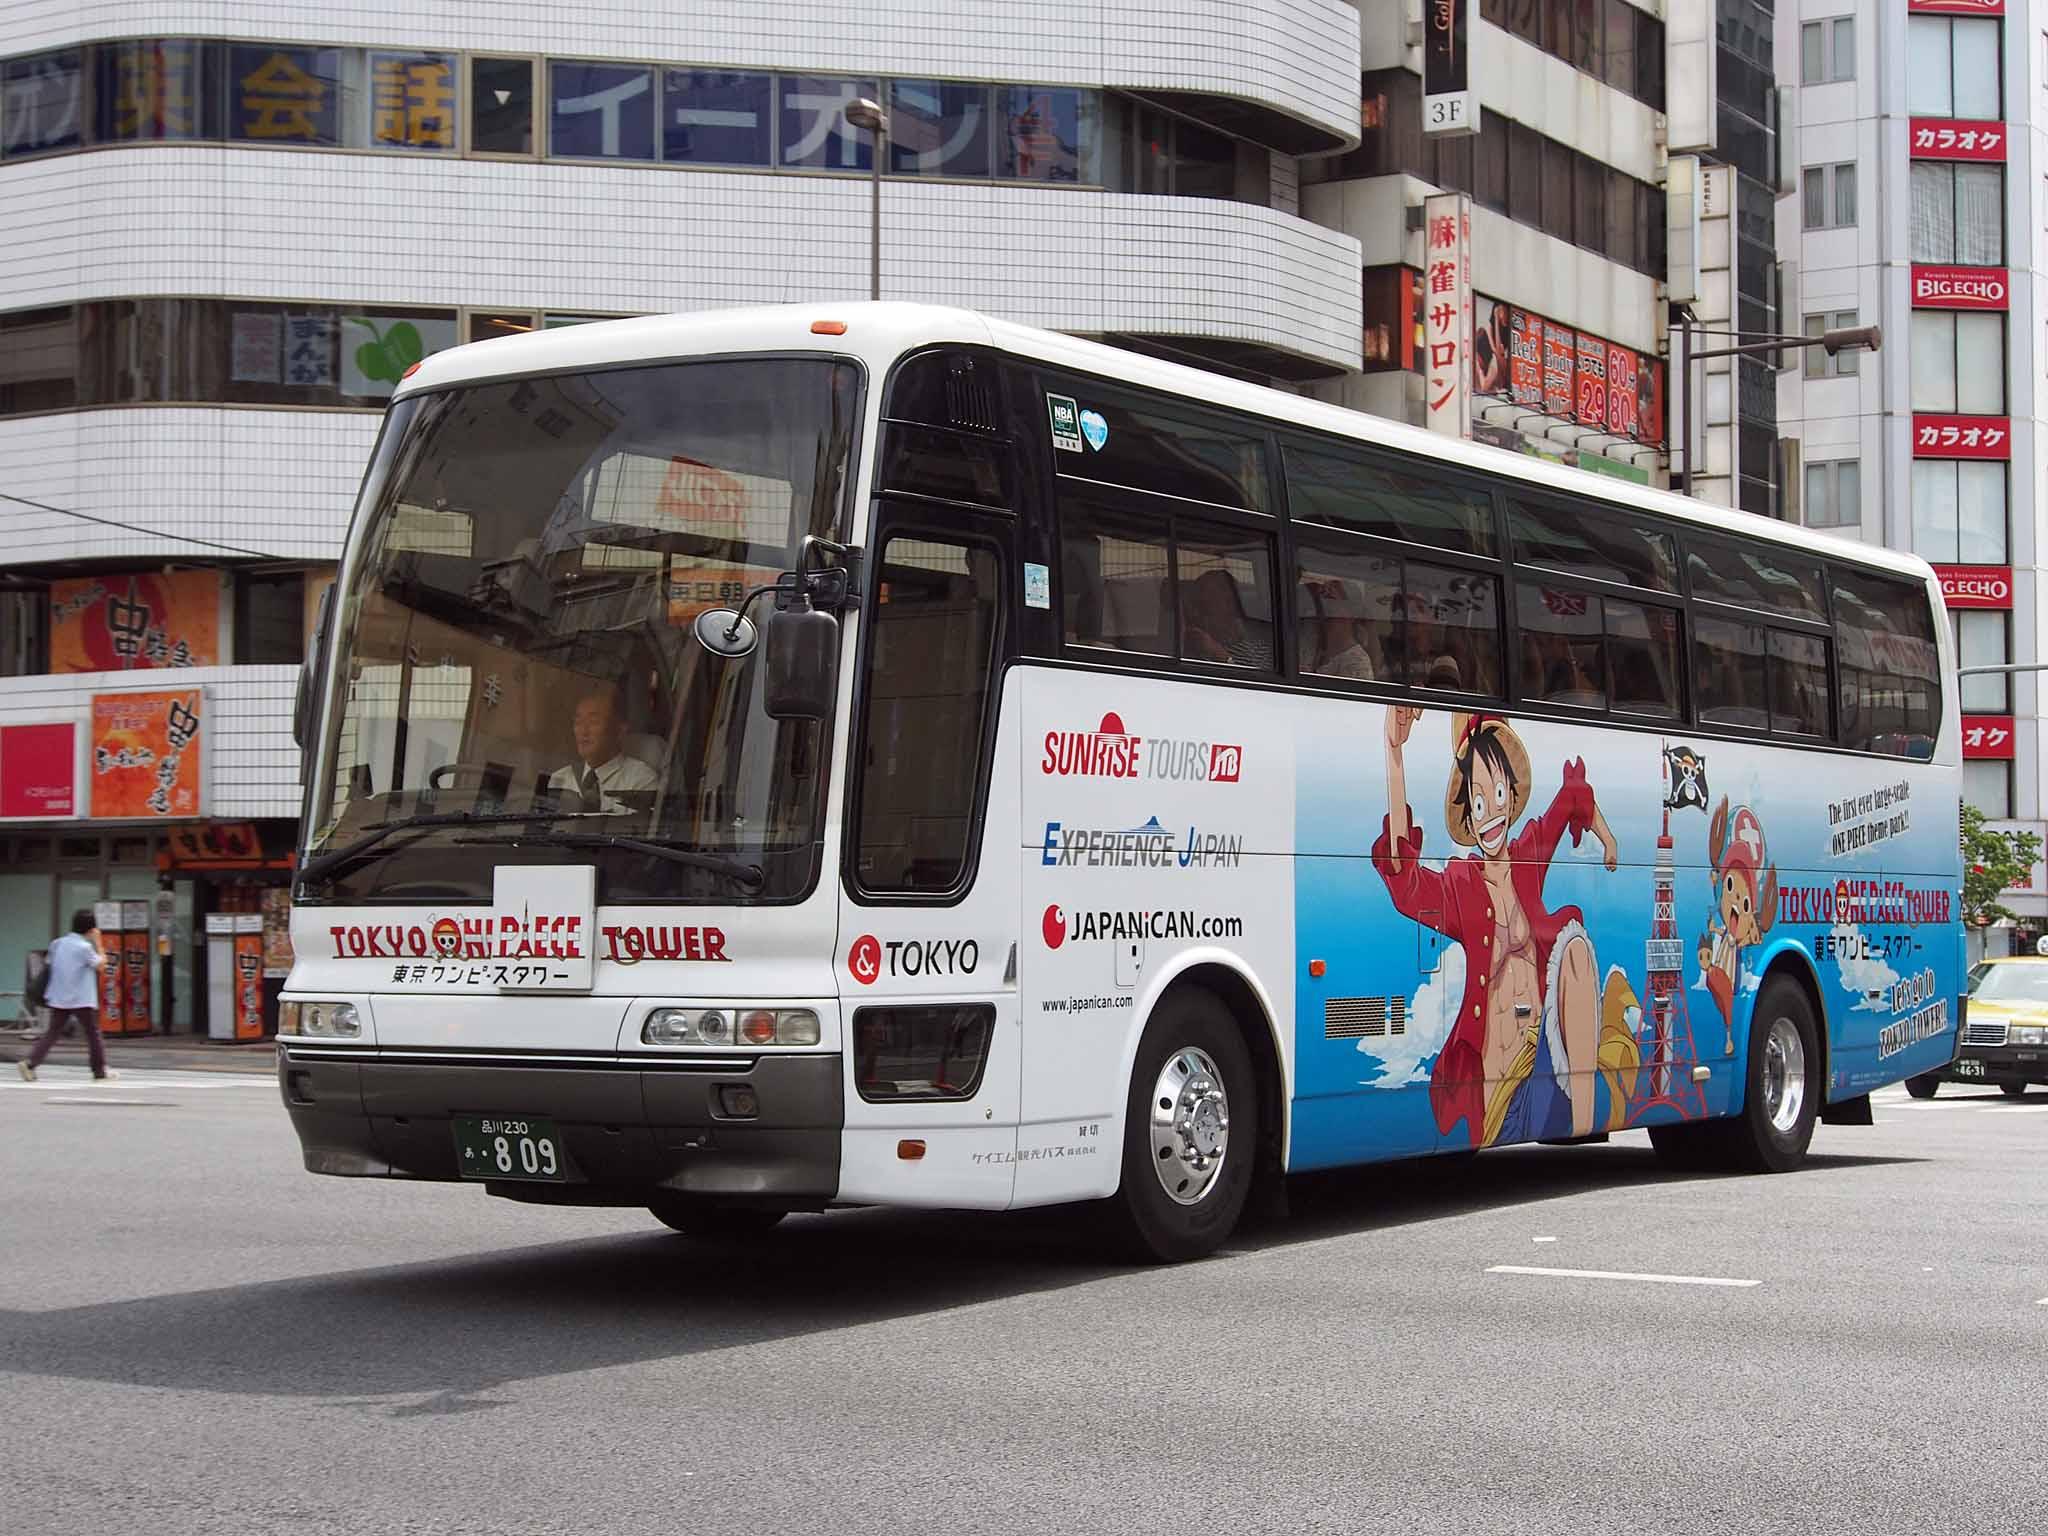 File:KM Kanko Bus 809 Tokyo One Piece Tower Advertise Aero Queen 1